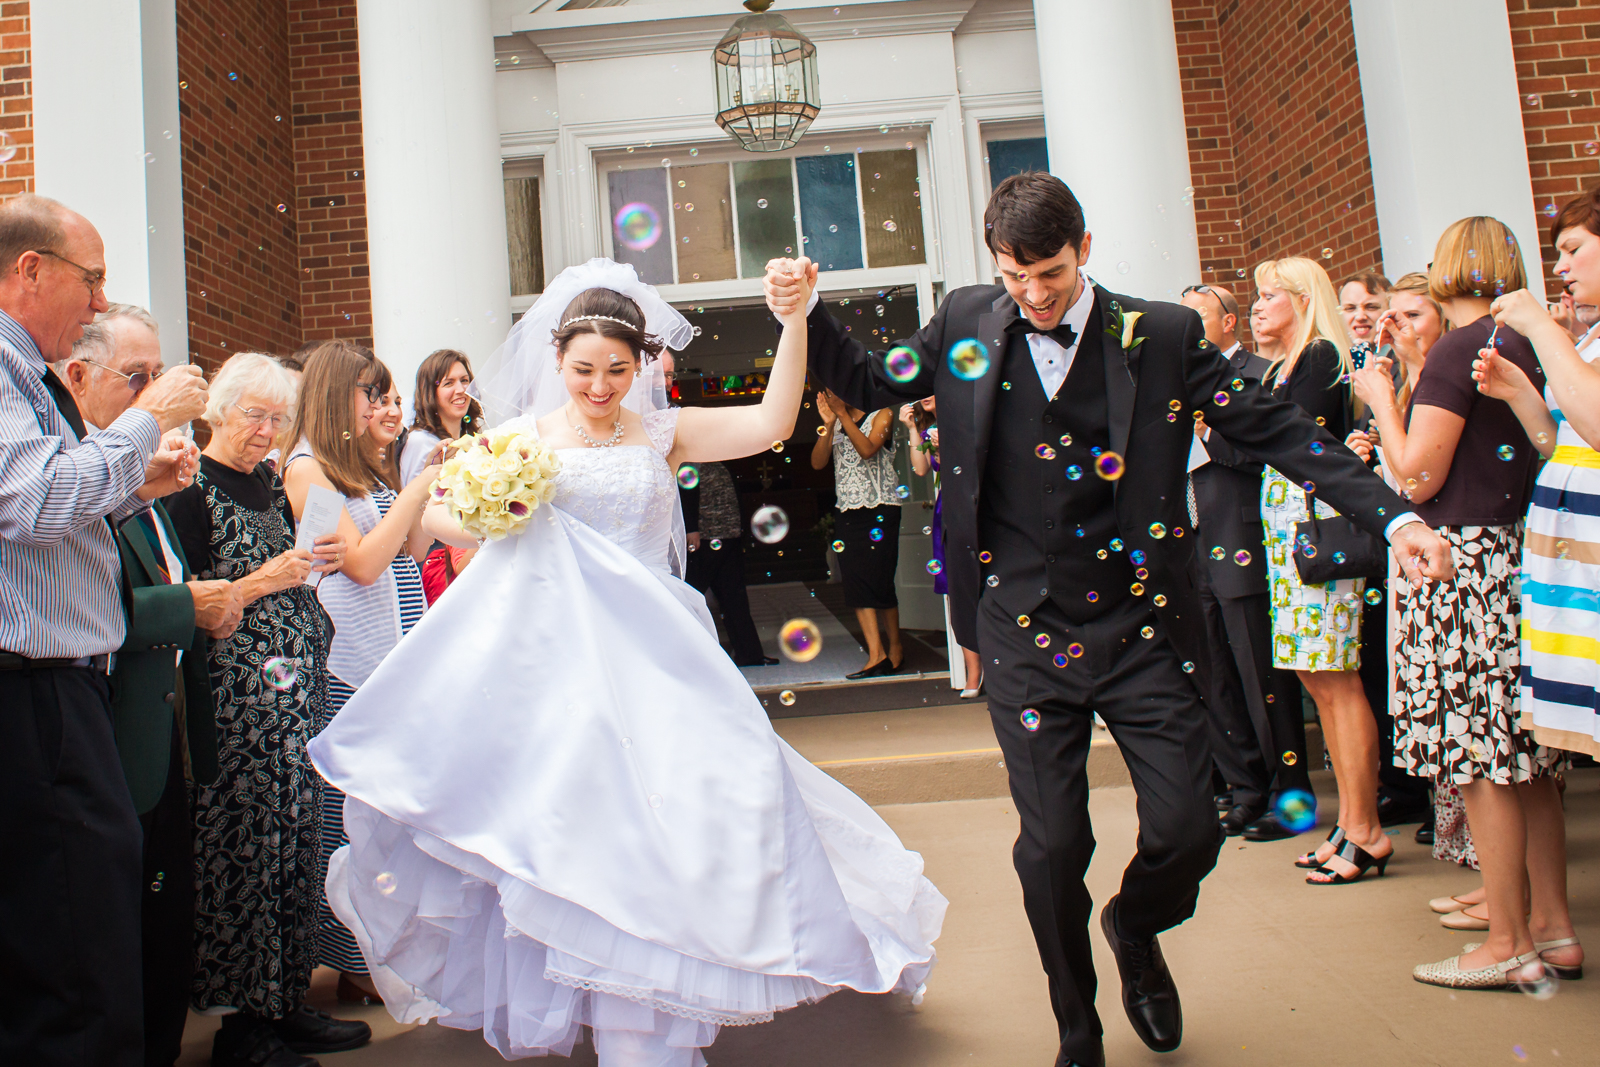 naperville-wedding-photography-56.jpg